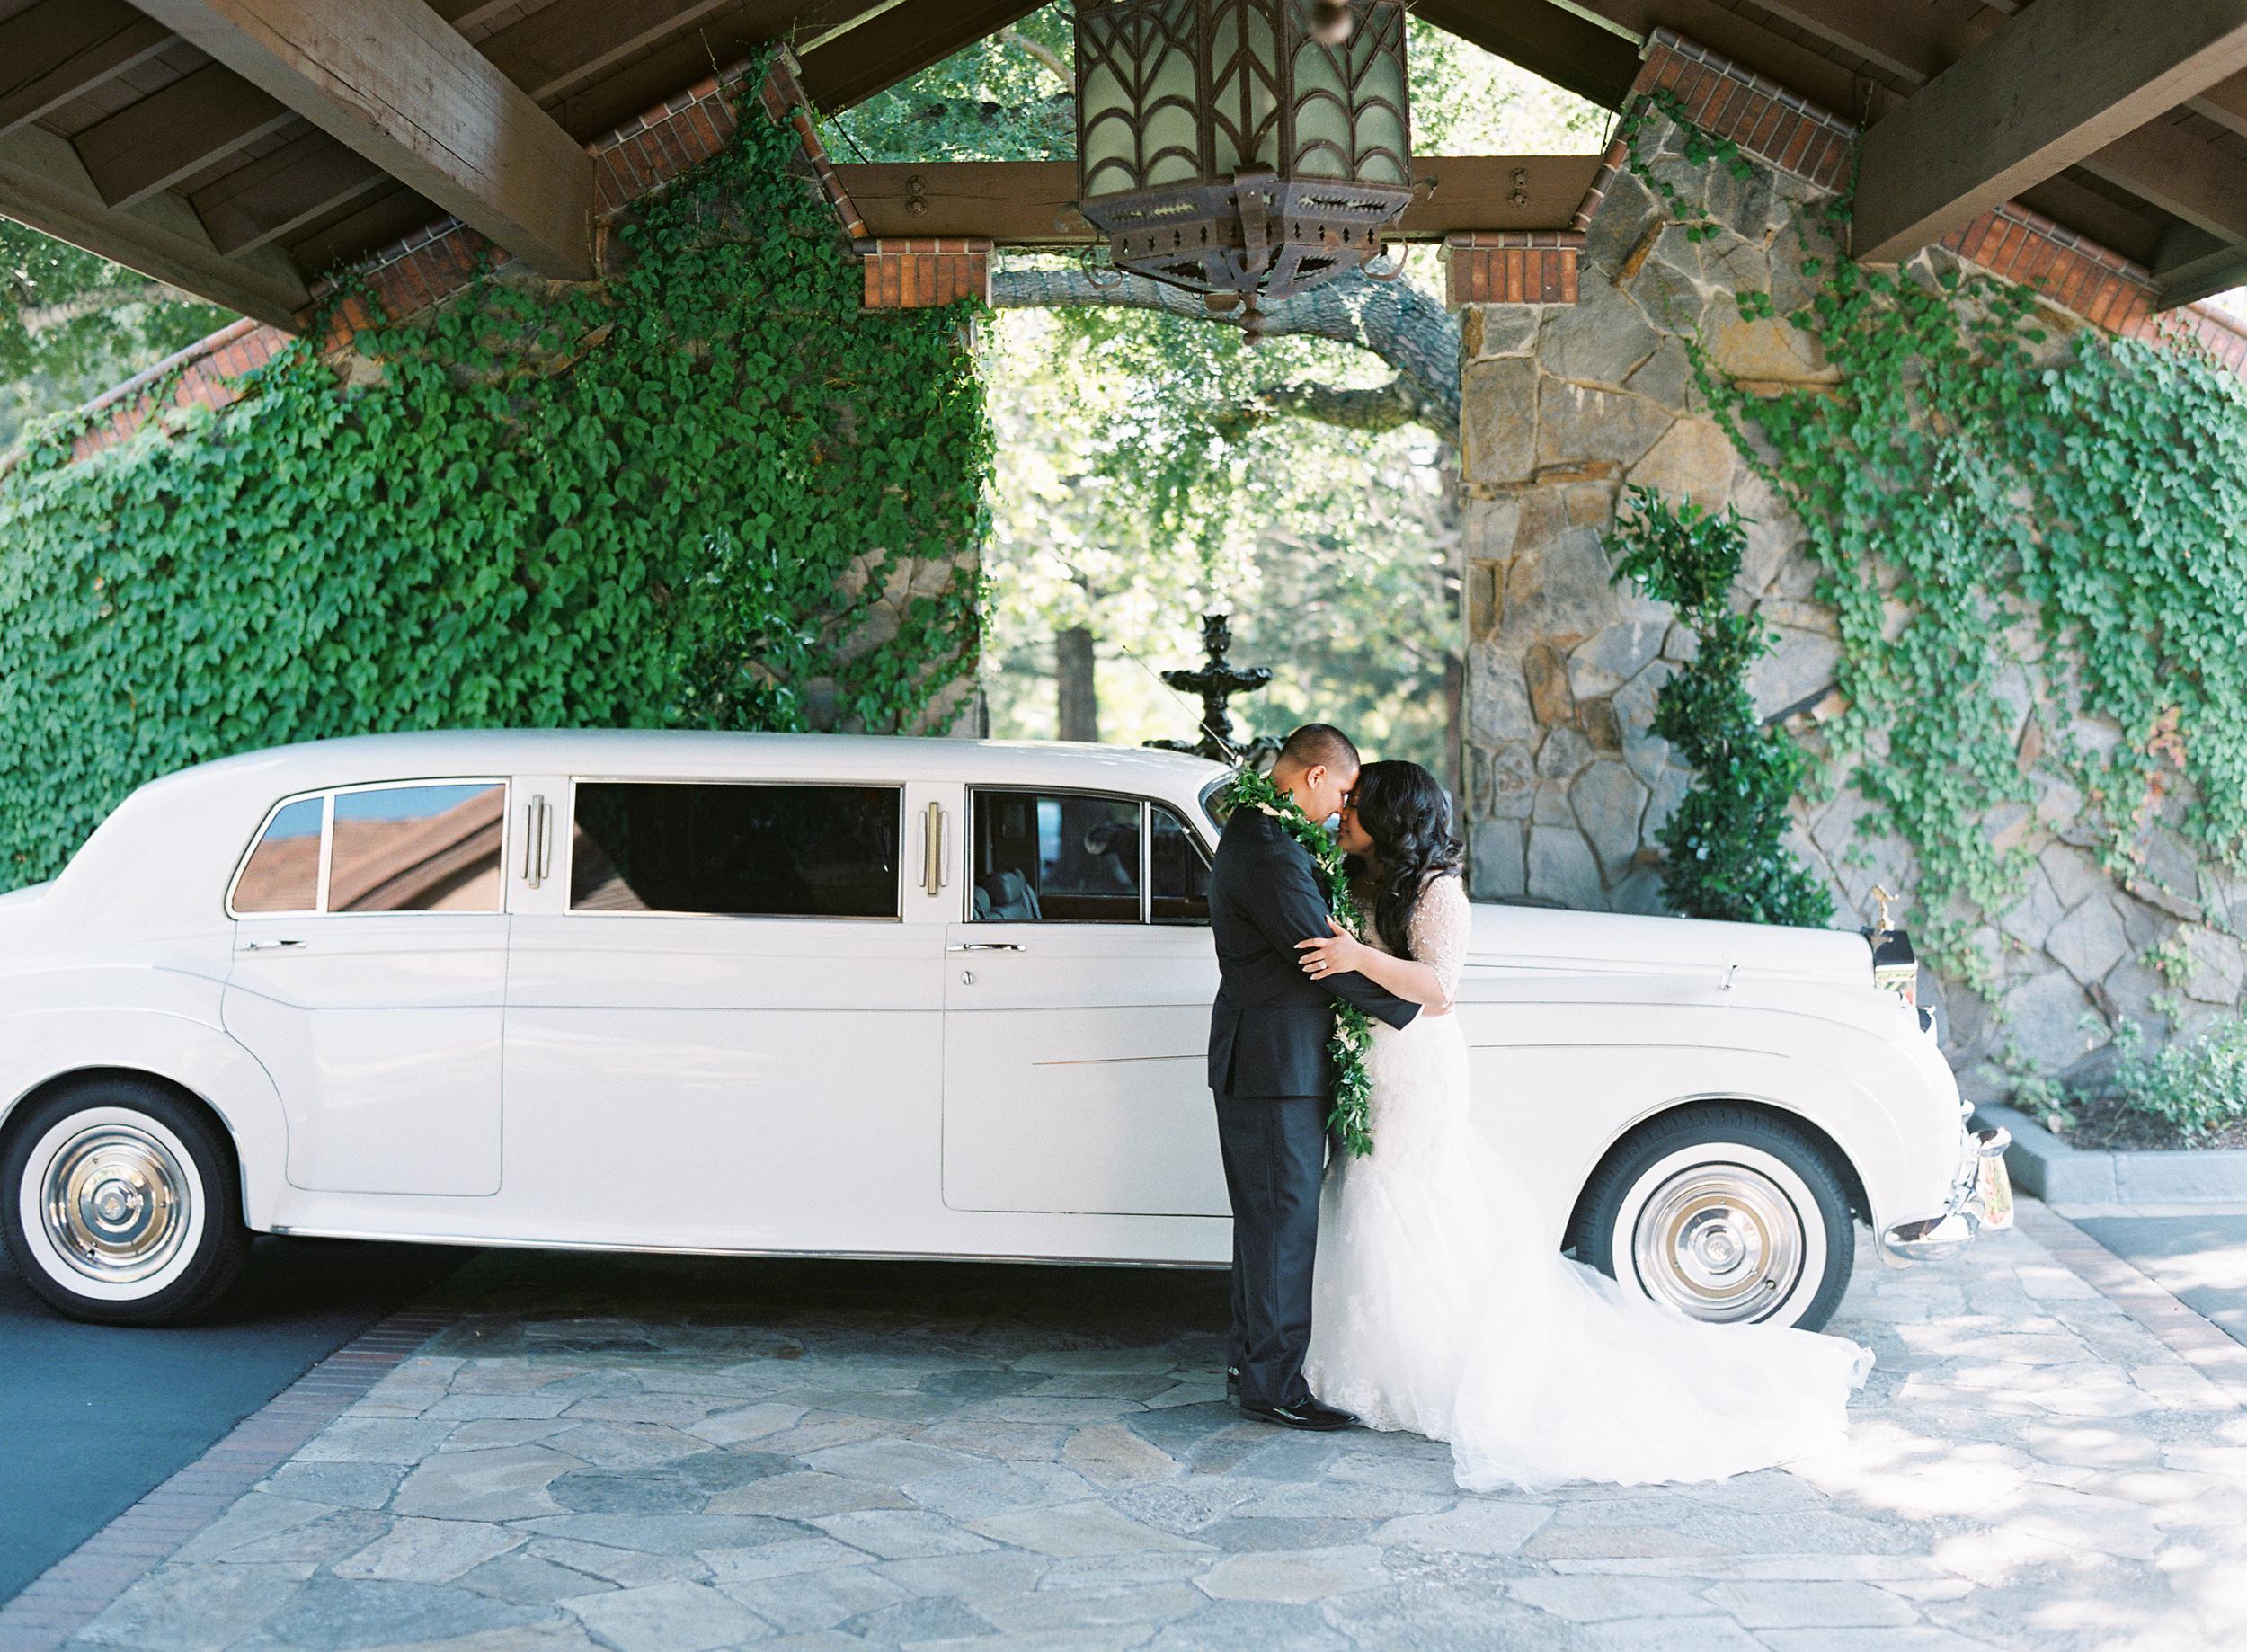 hawaiian-inspired-wedding-in-danville-california-014.jpg